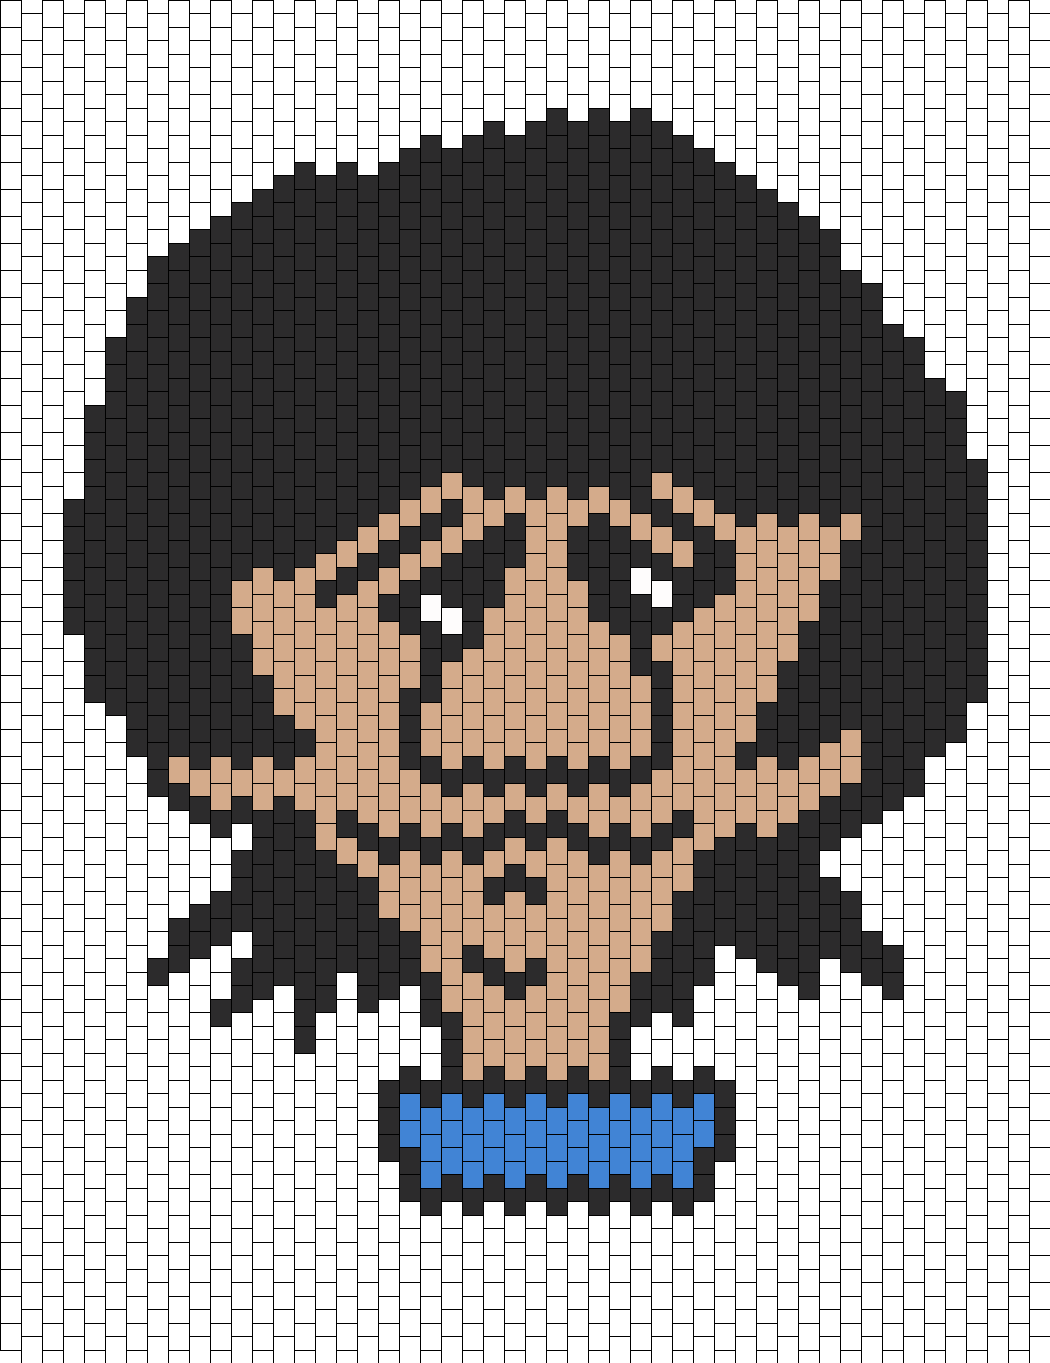 Ringo Star From The Beatles Cartoon